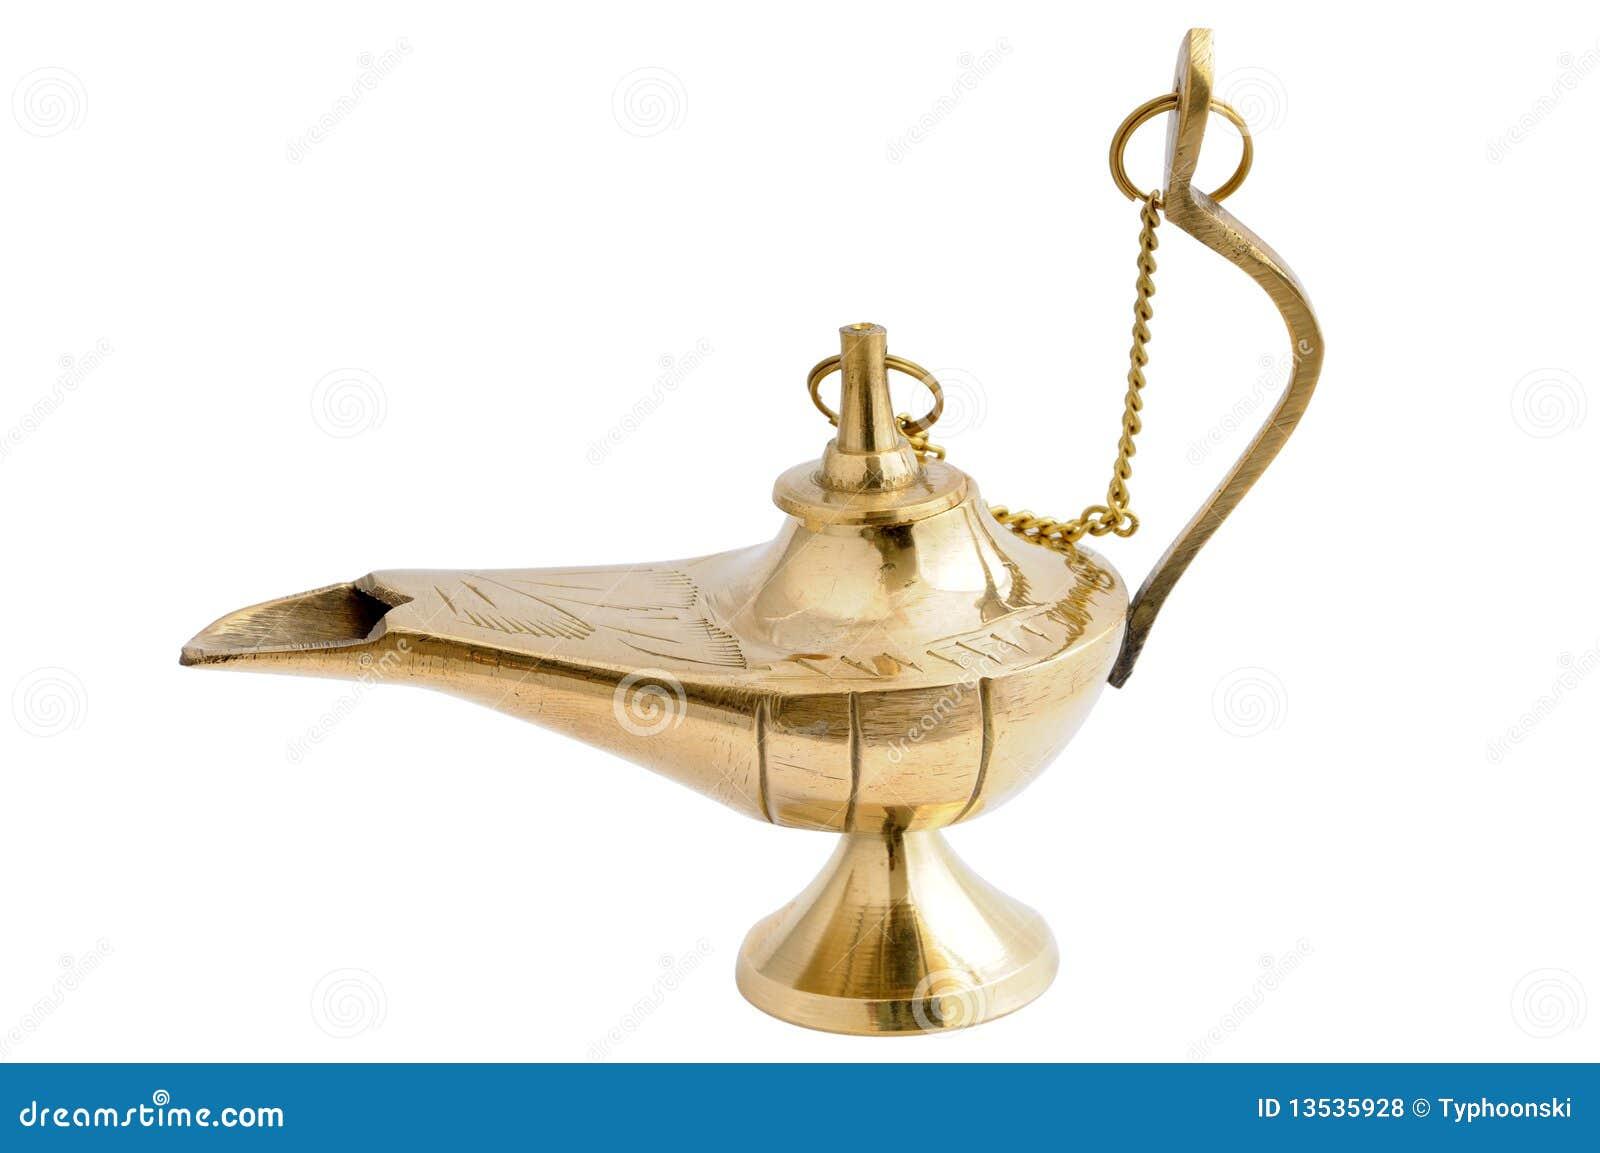 Arabic Oil Lamp stock photo. Image of golden, antique - 13535928 for Arabic Oil Lamp  150ifm